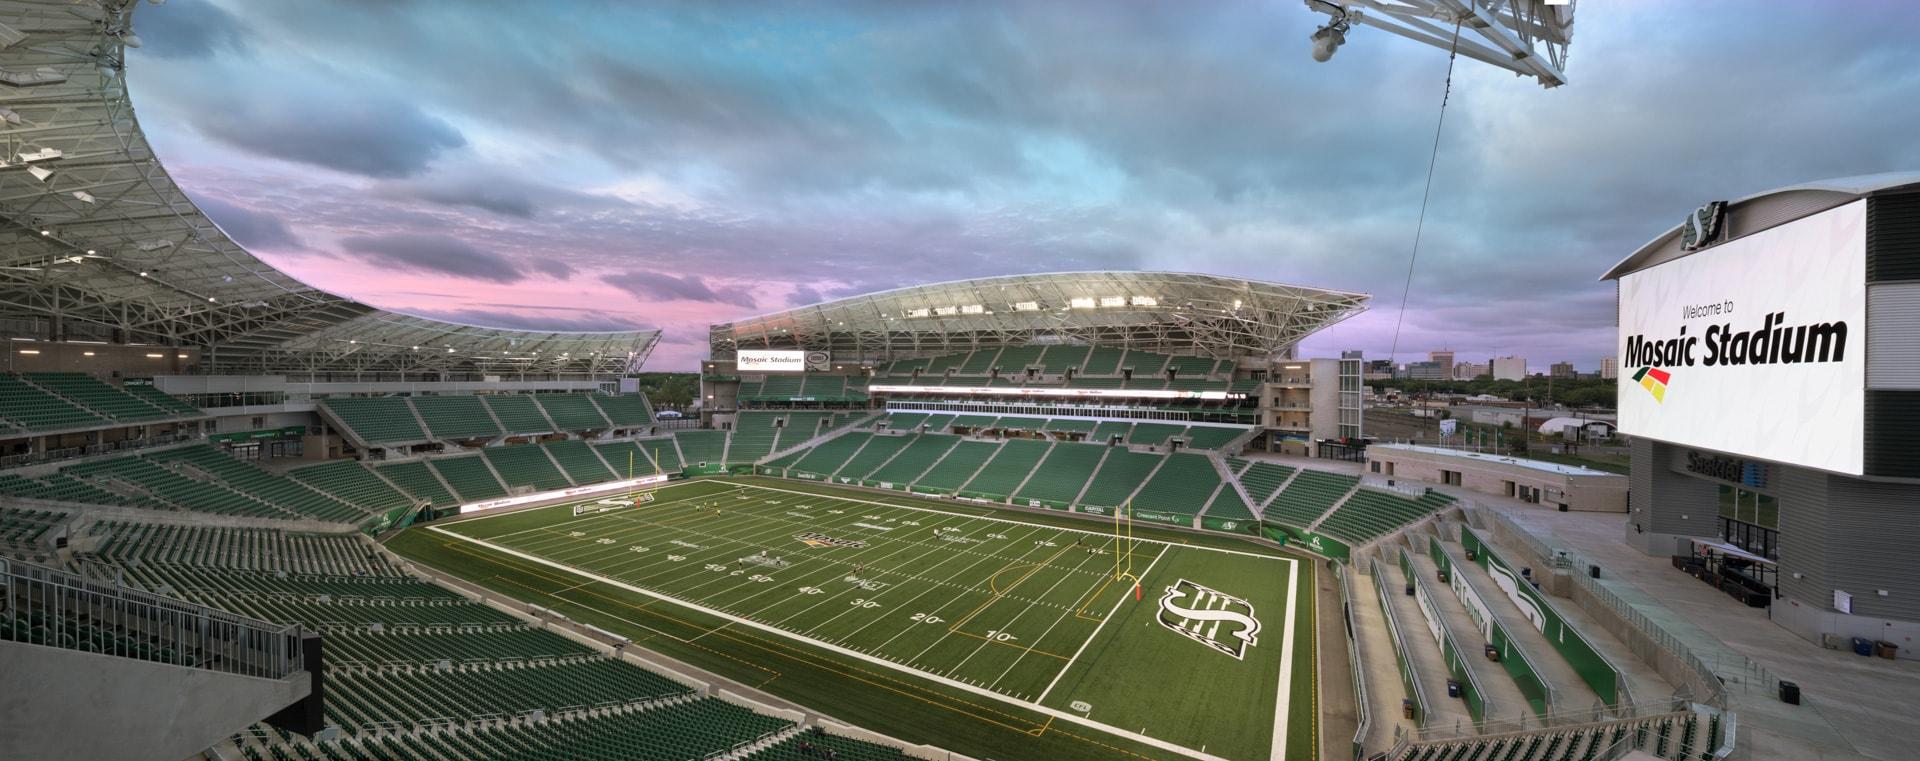 photographing mosaic stadium